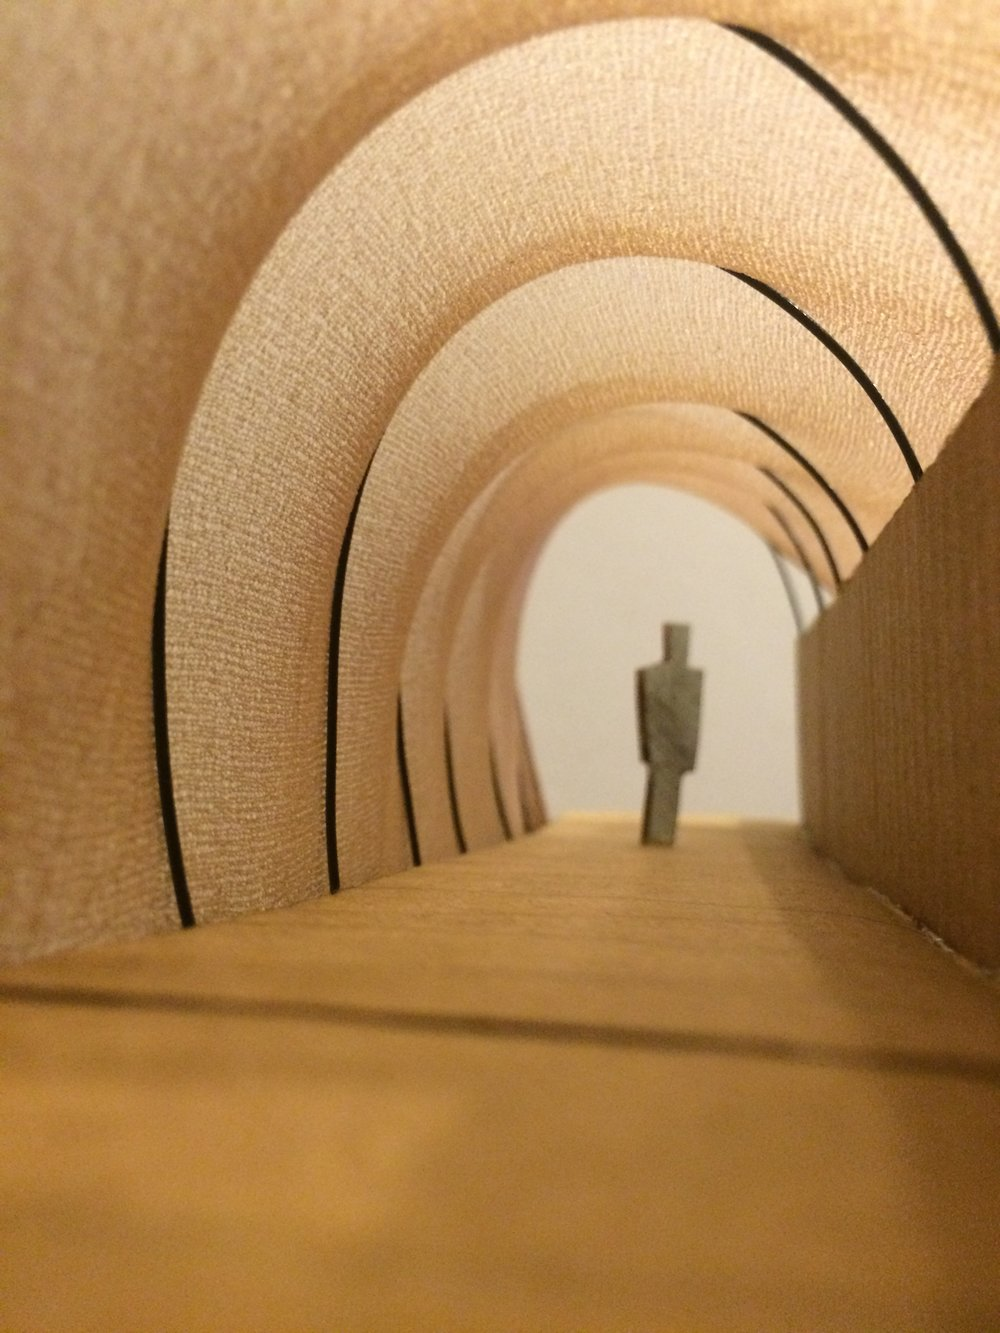 Tunnel Sculpture 2.JPG